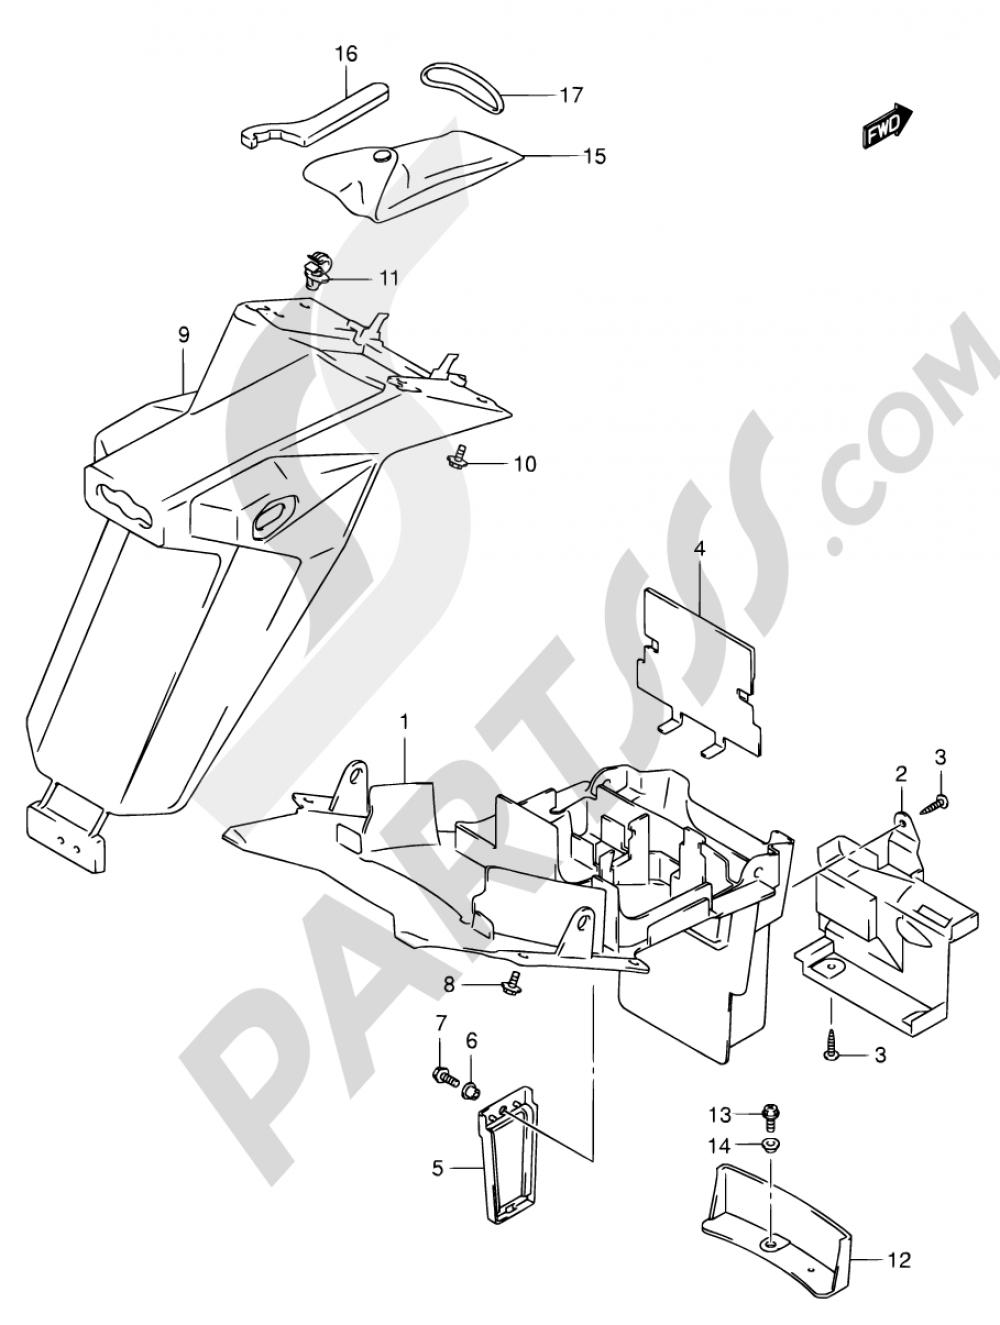 51A - REAR FENDER (MODEL K4/K5/K6/K7) Suzuki SV650S 2005